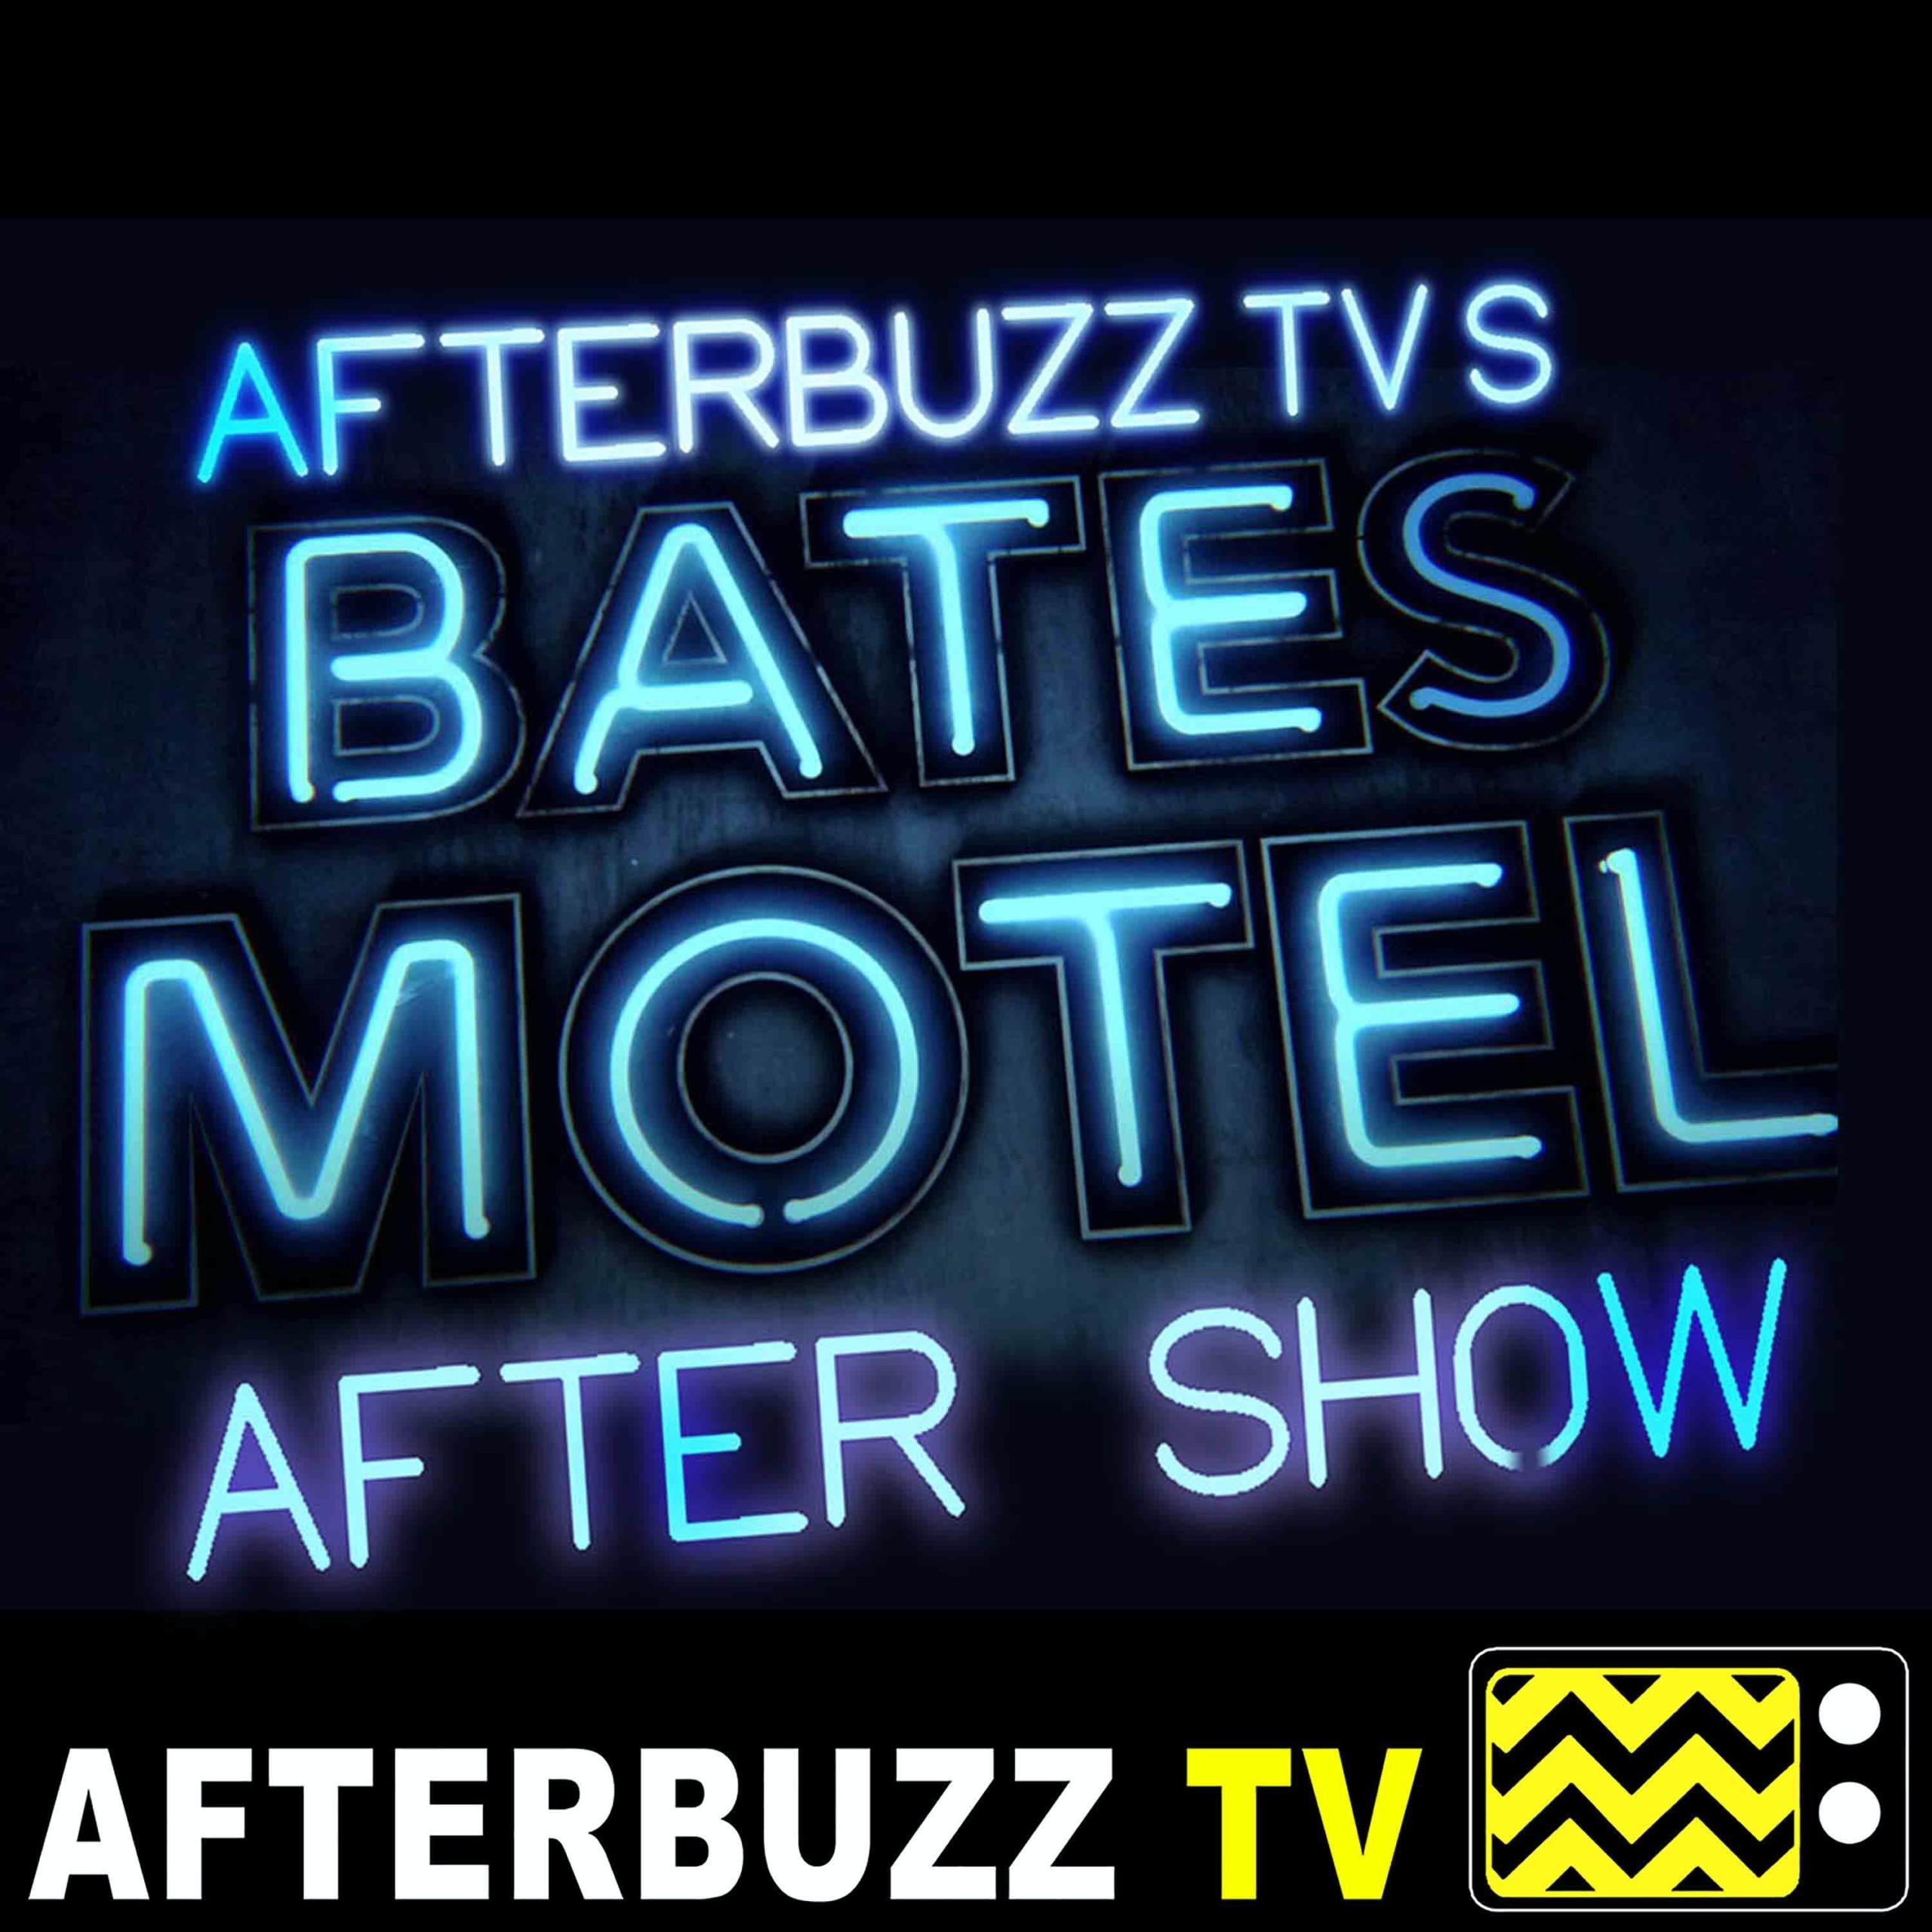 The Bates Motel Podcast